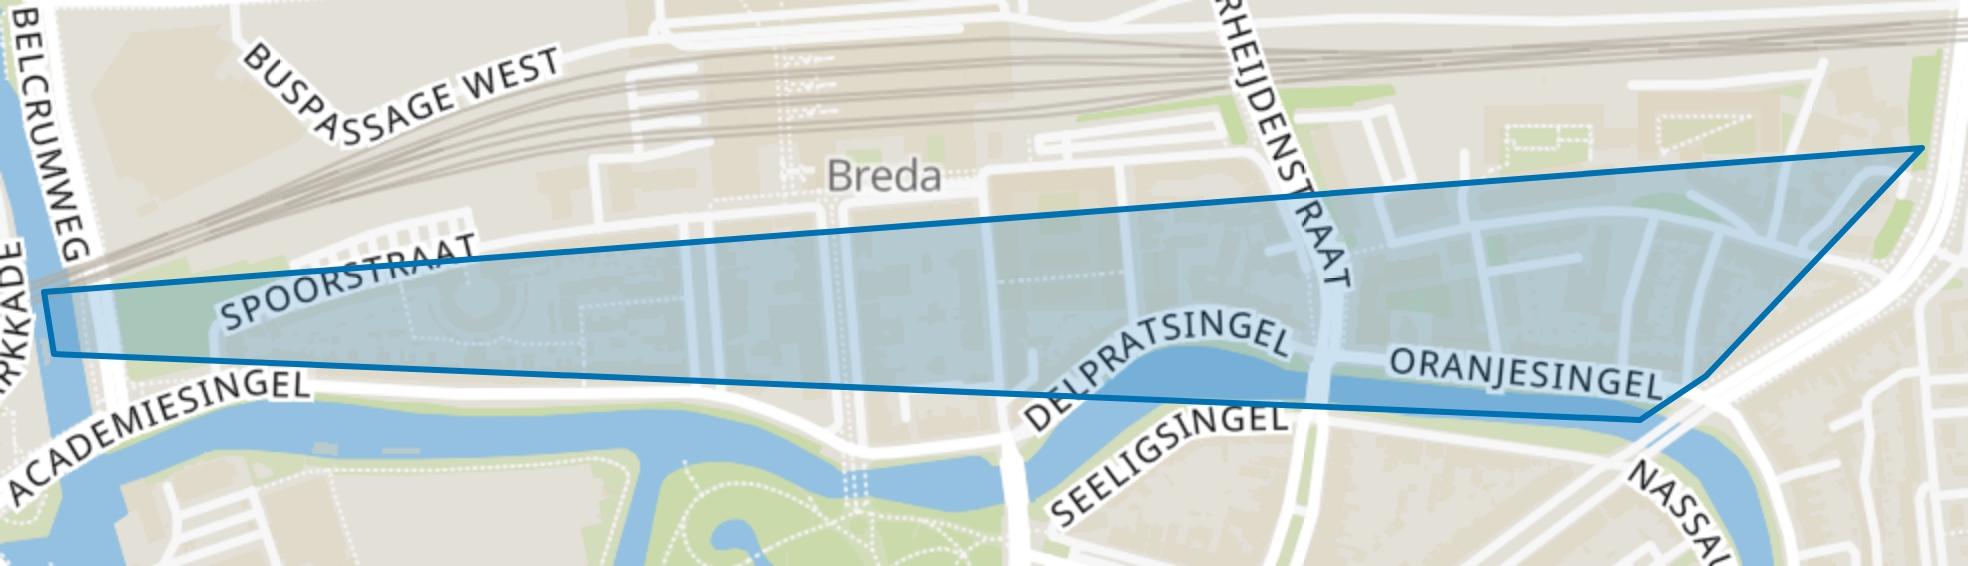 Station, Breda map